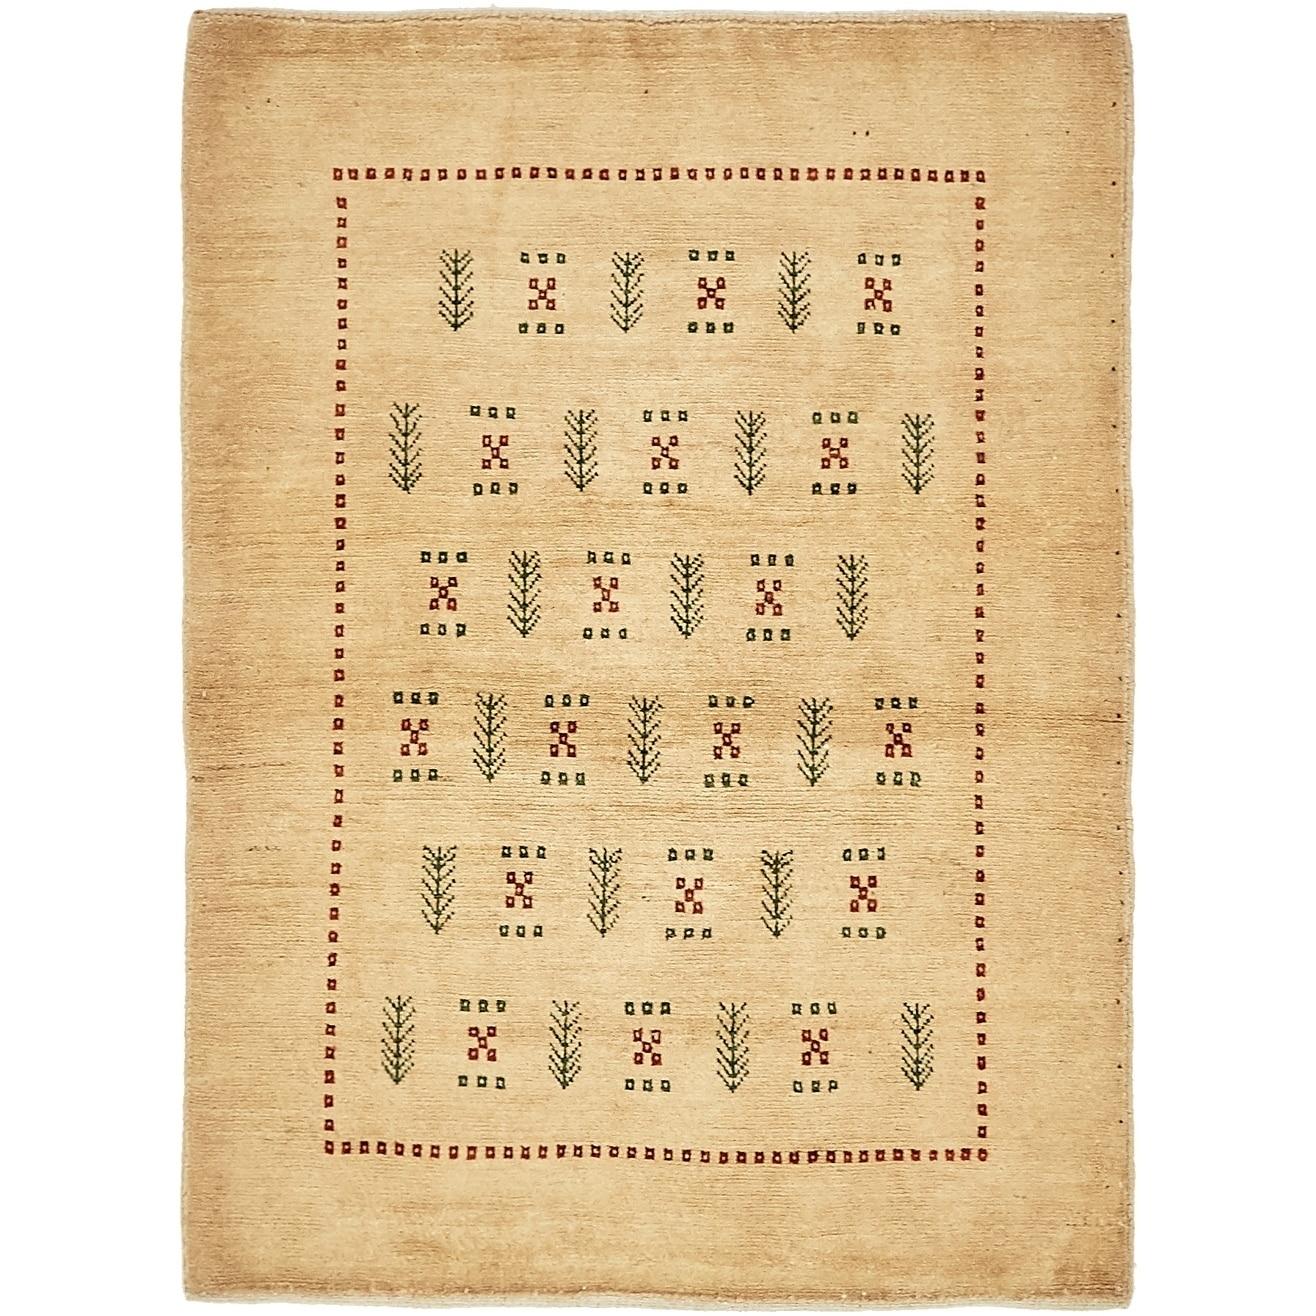 Hand Knotted Kashkuli Gabbeh Wool Area Rug - 3 7 x 5 (Beige - 3 7 x 5)